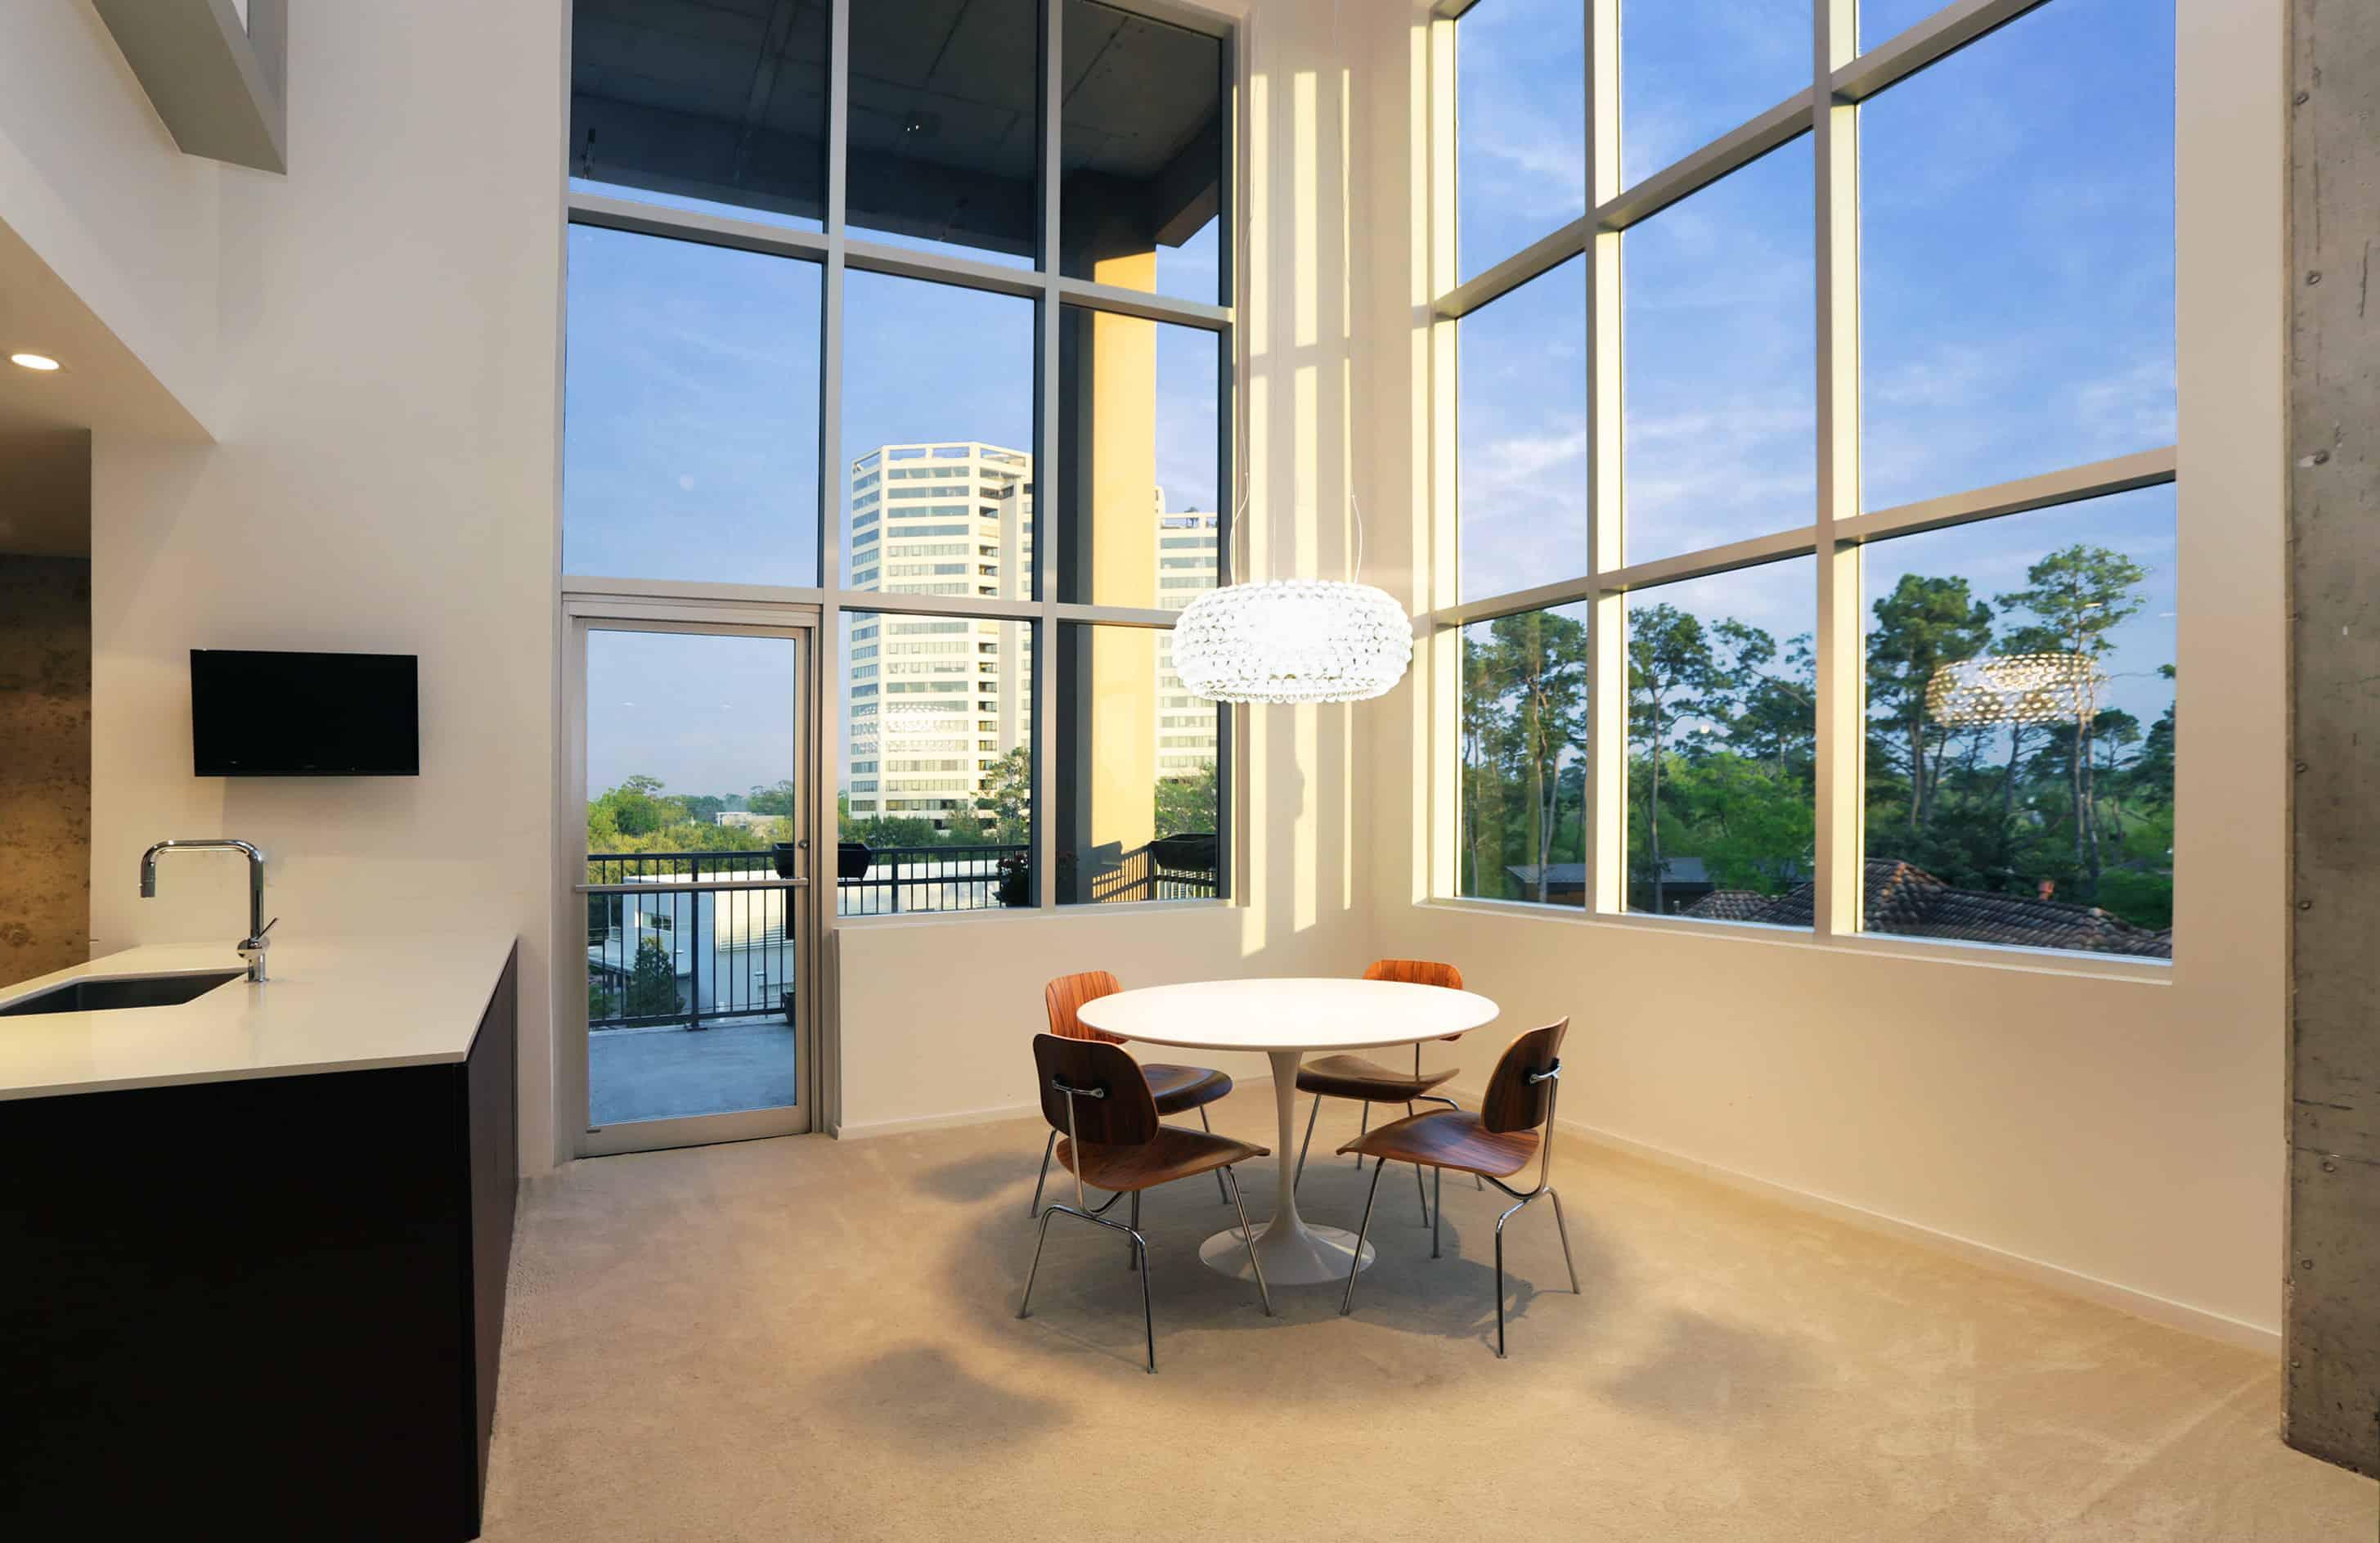 Memorial Luxury Loft bedroom industrial mid century furnishings walnut wood kitchen with large glass